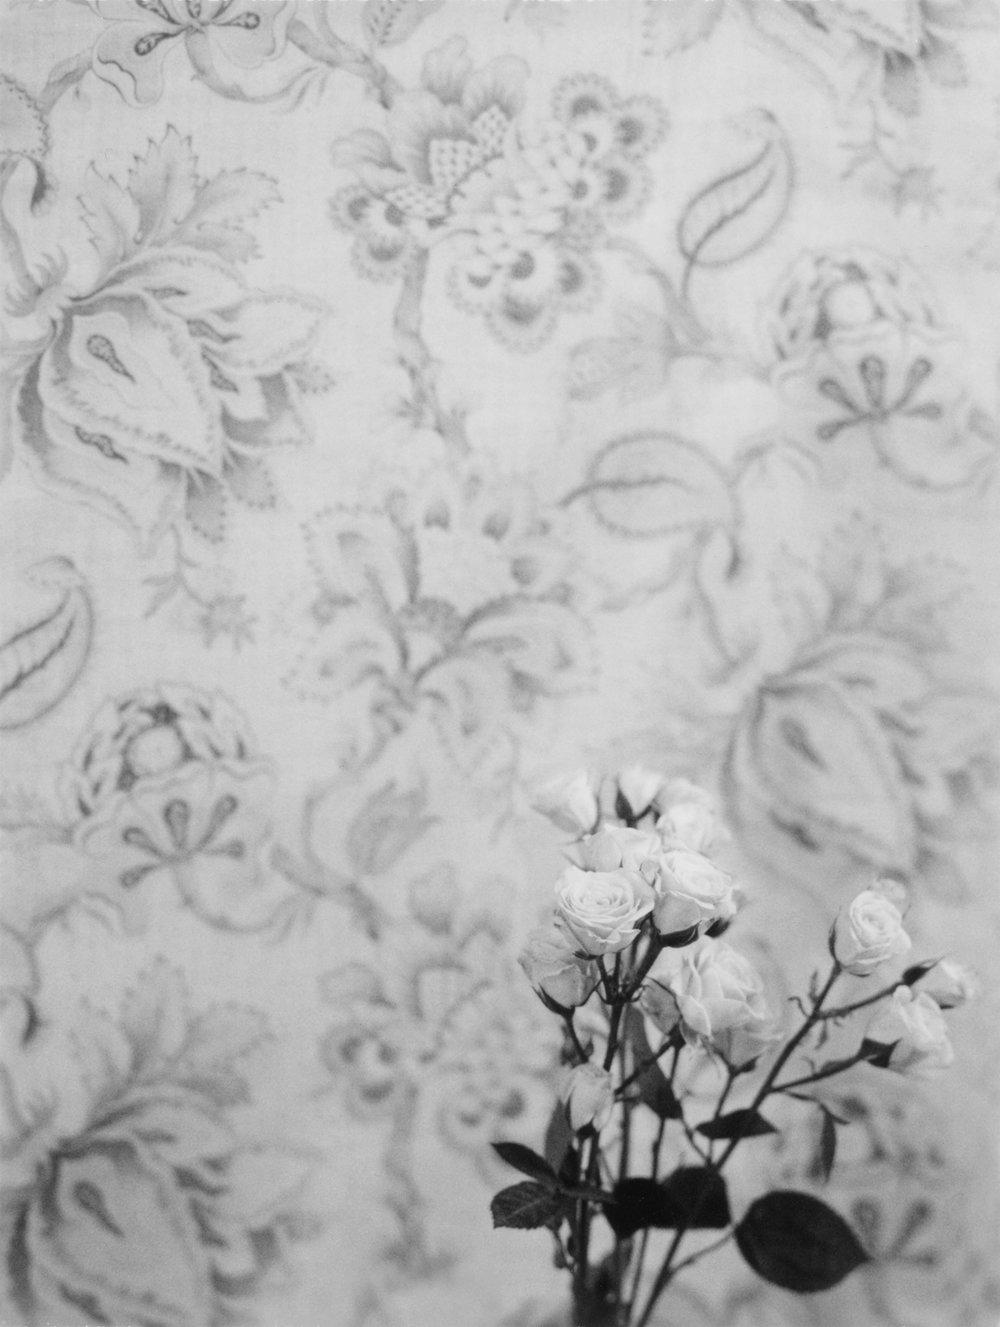 Bouquet for Robert Mapplethorpe